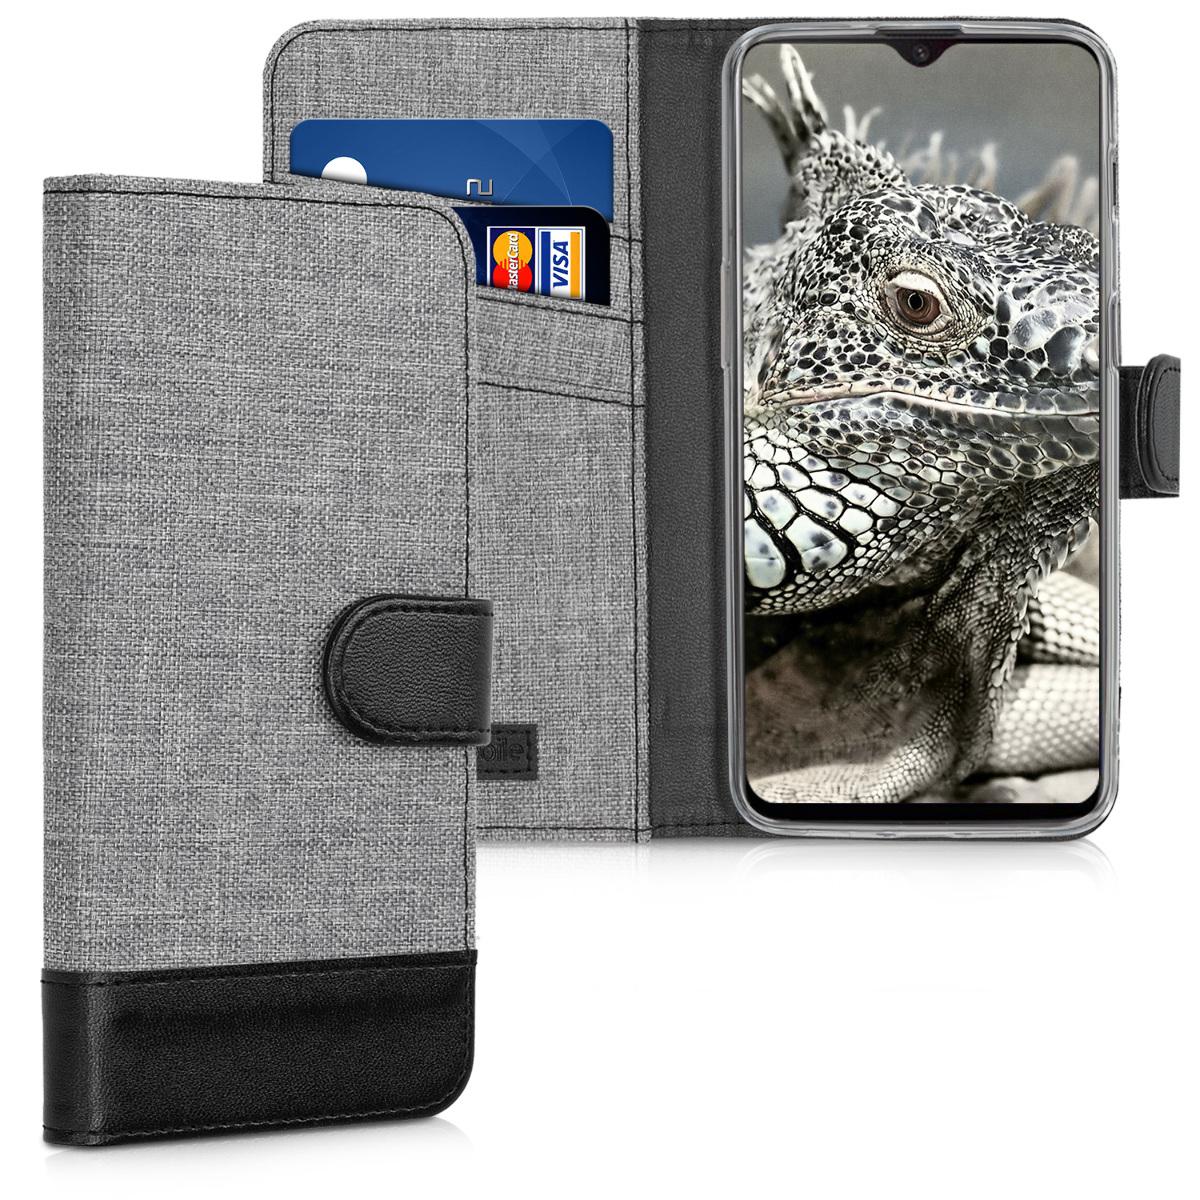 KW Θήκη-Πορτοφόλι OnePlus 6T - Grey / Black (46319.22)